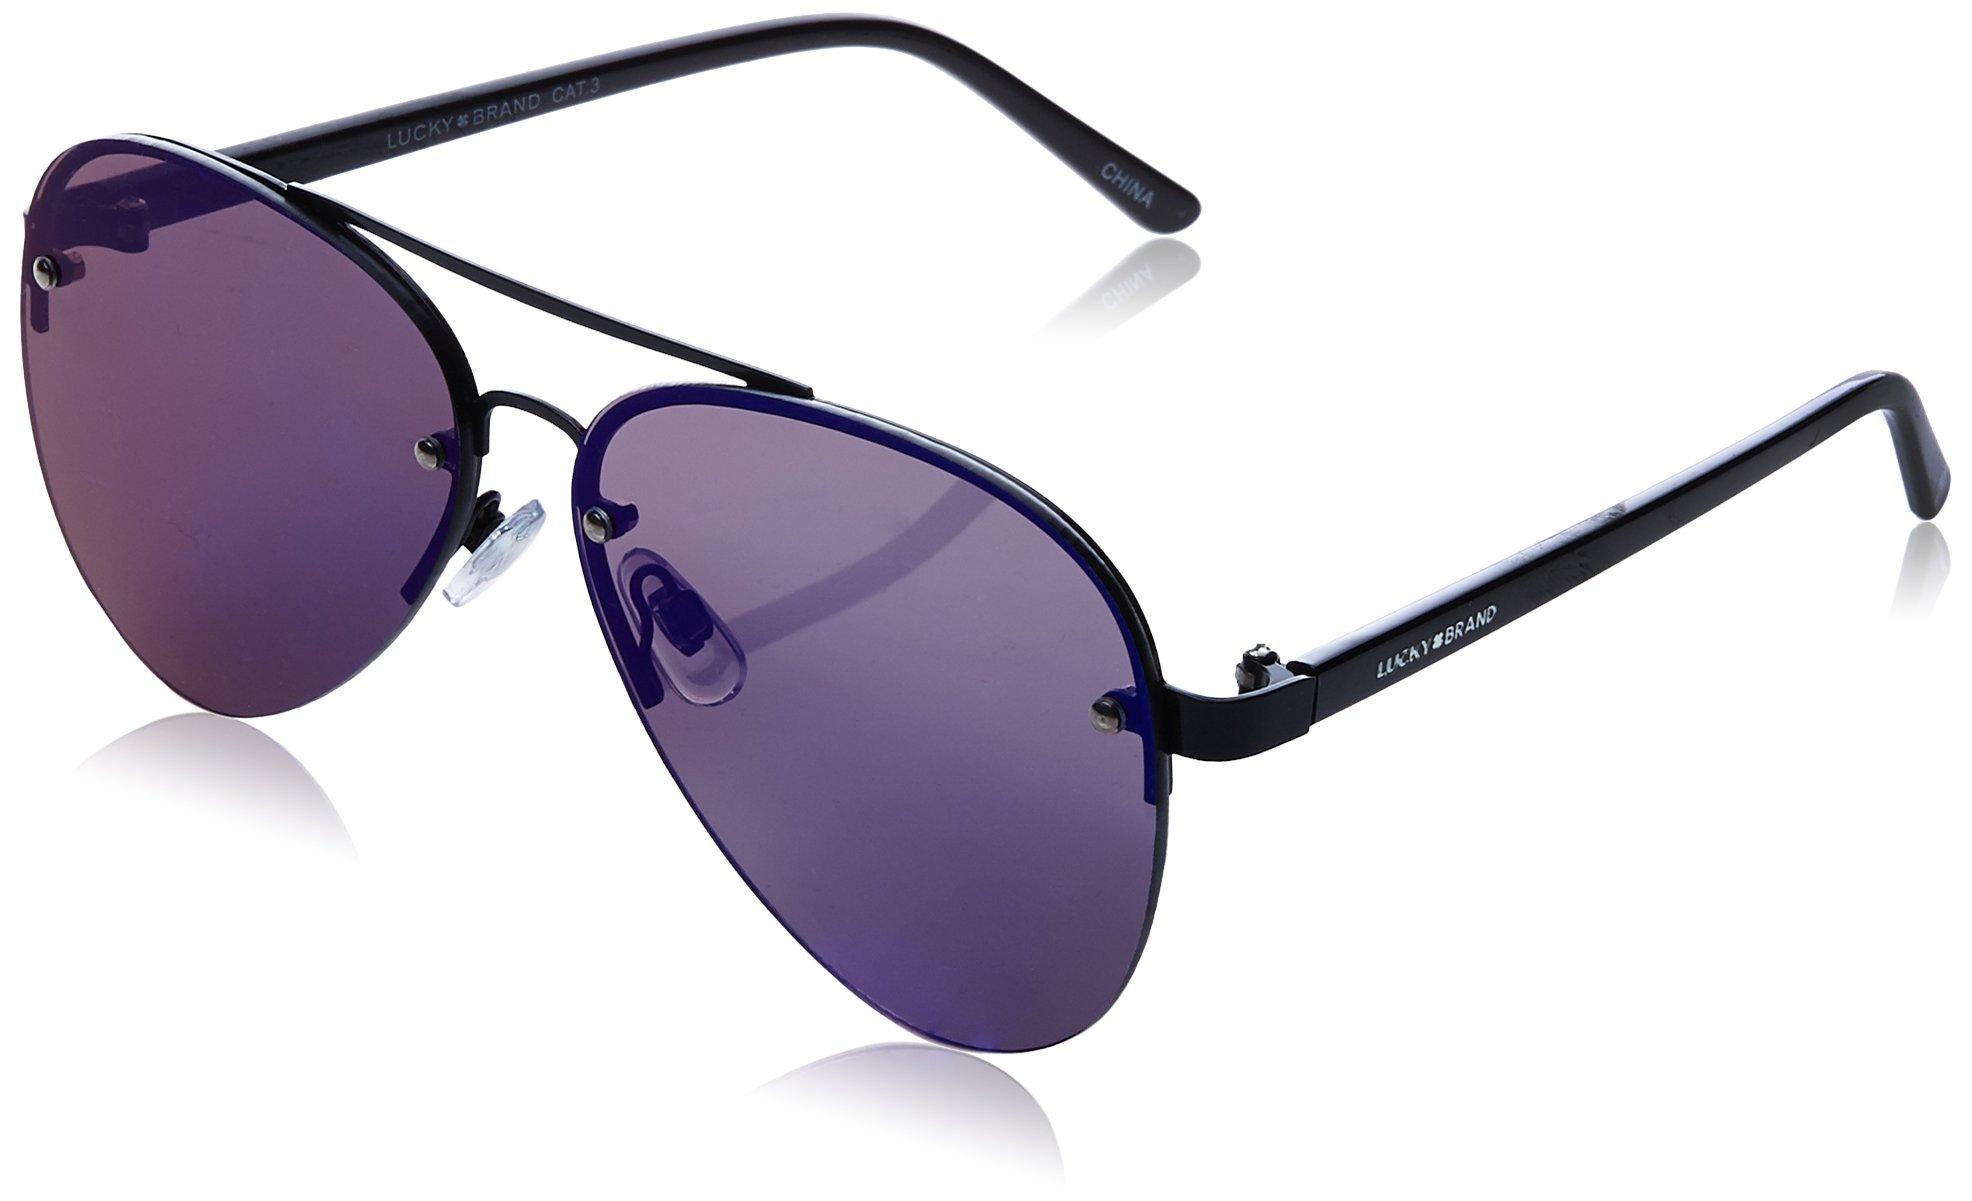 Lucky Avalbla65 Aviator Sunglasses, Black, 65 mm